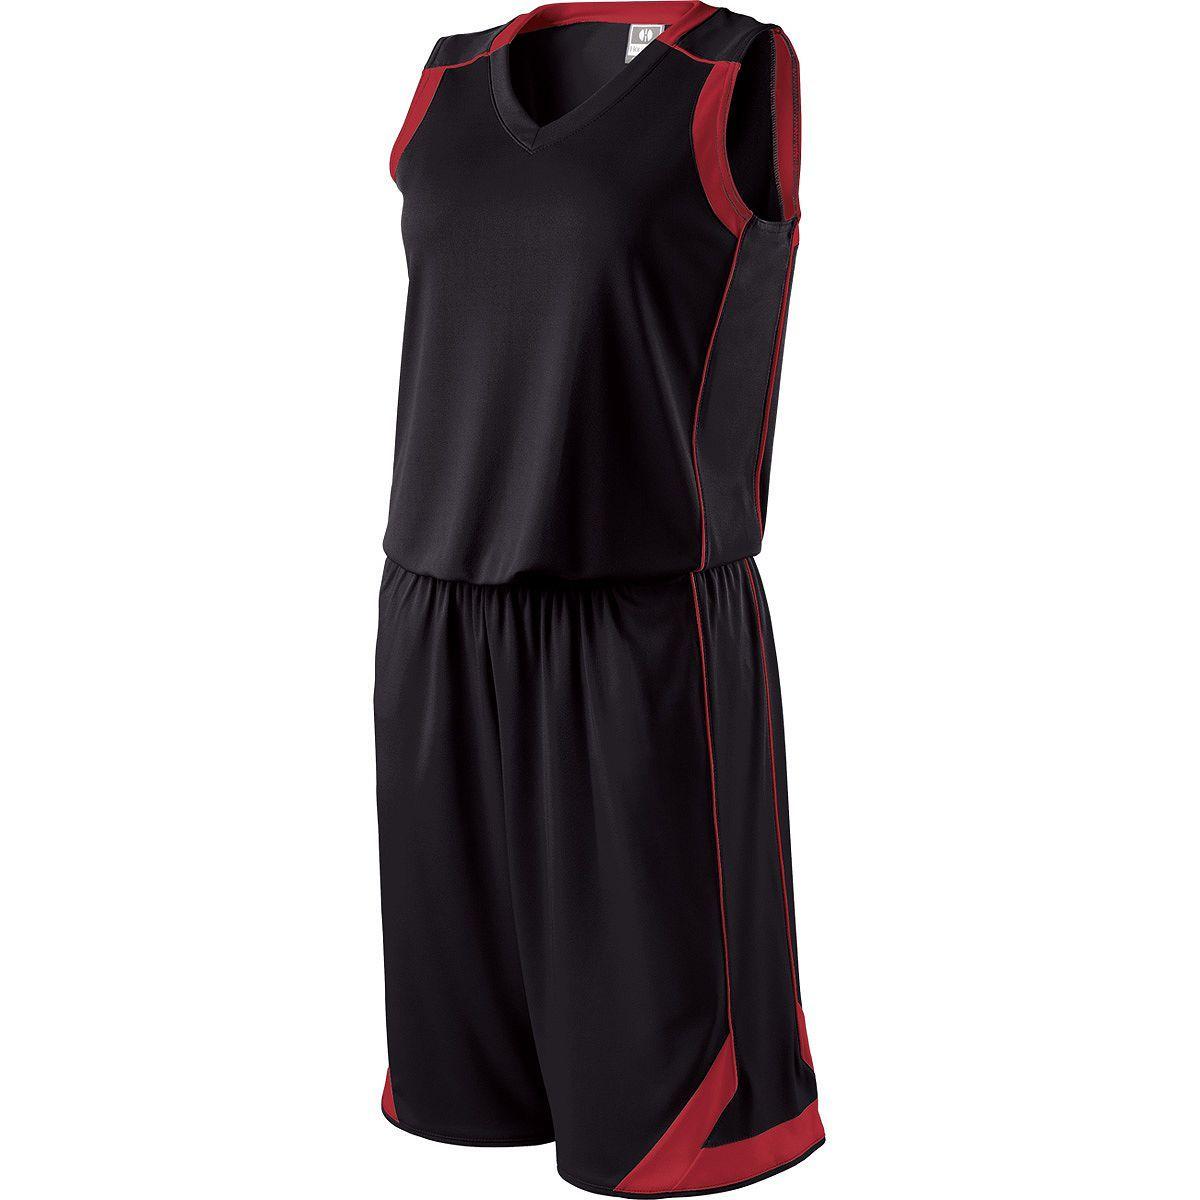 Ladies Carthage Basketball Shorts - BLACK/SCARLET